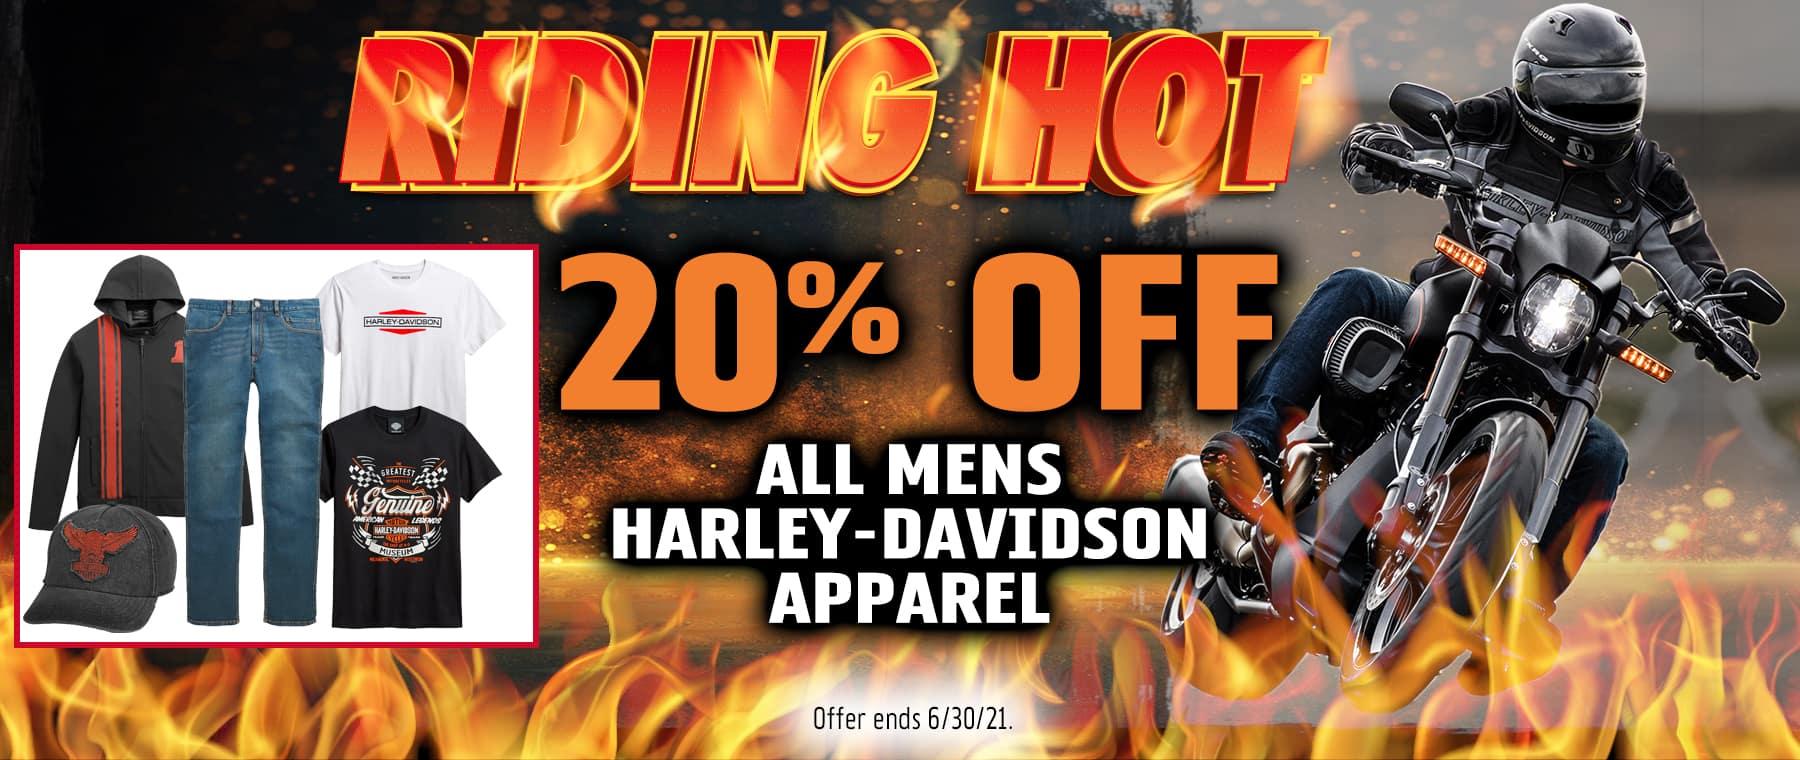 20% OFF ALL MENS HARLEY-DAVIDSON APPAREL